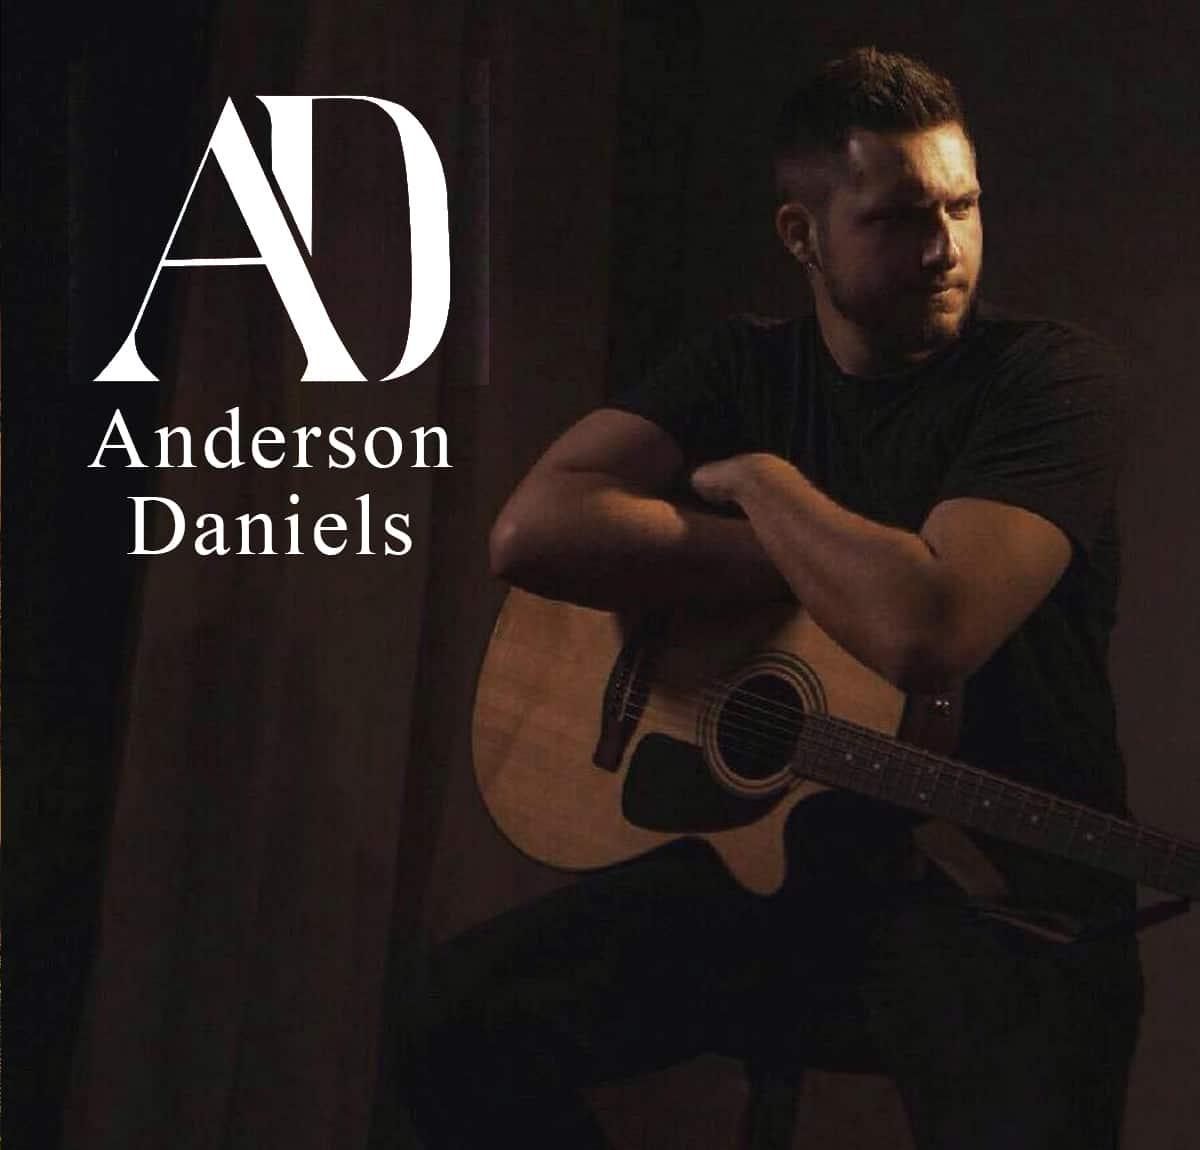 Anderson Daniels